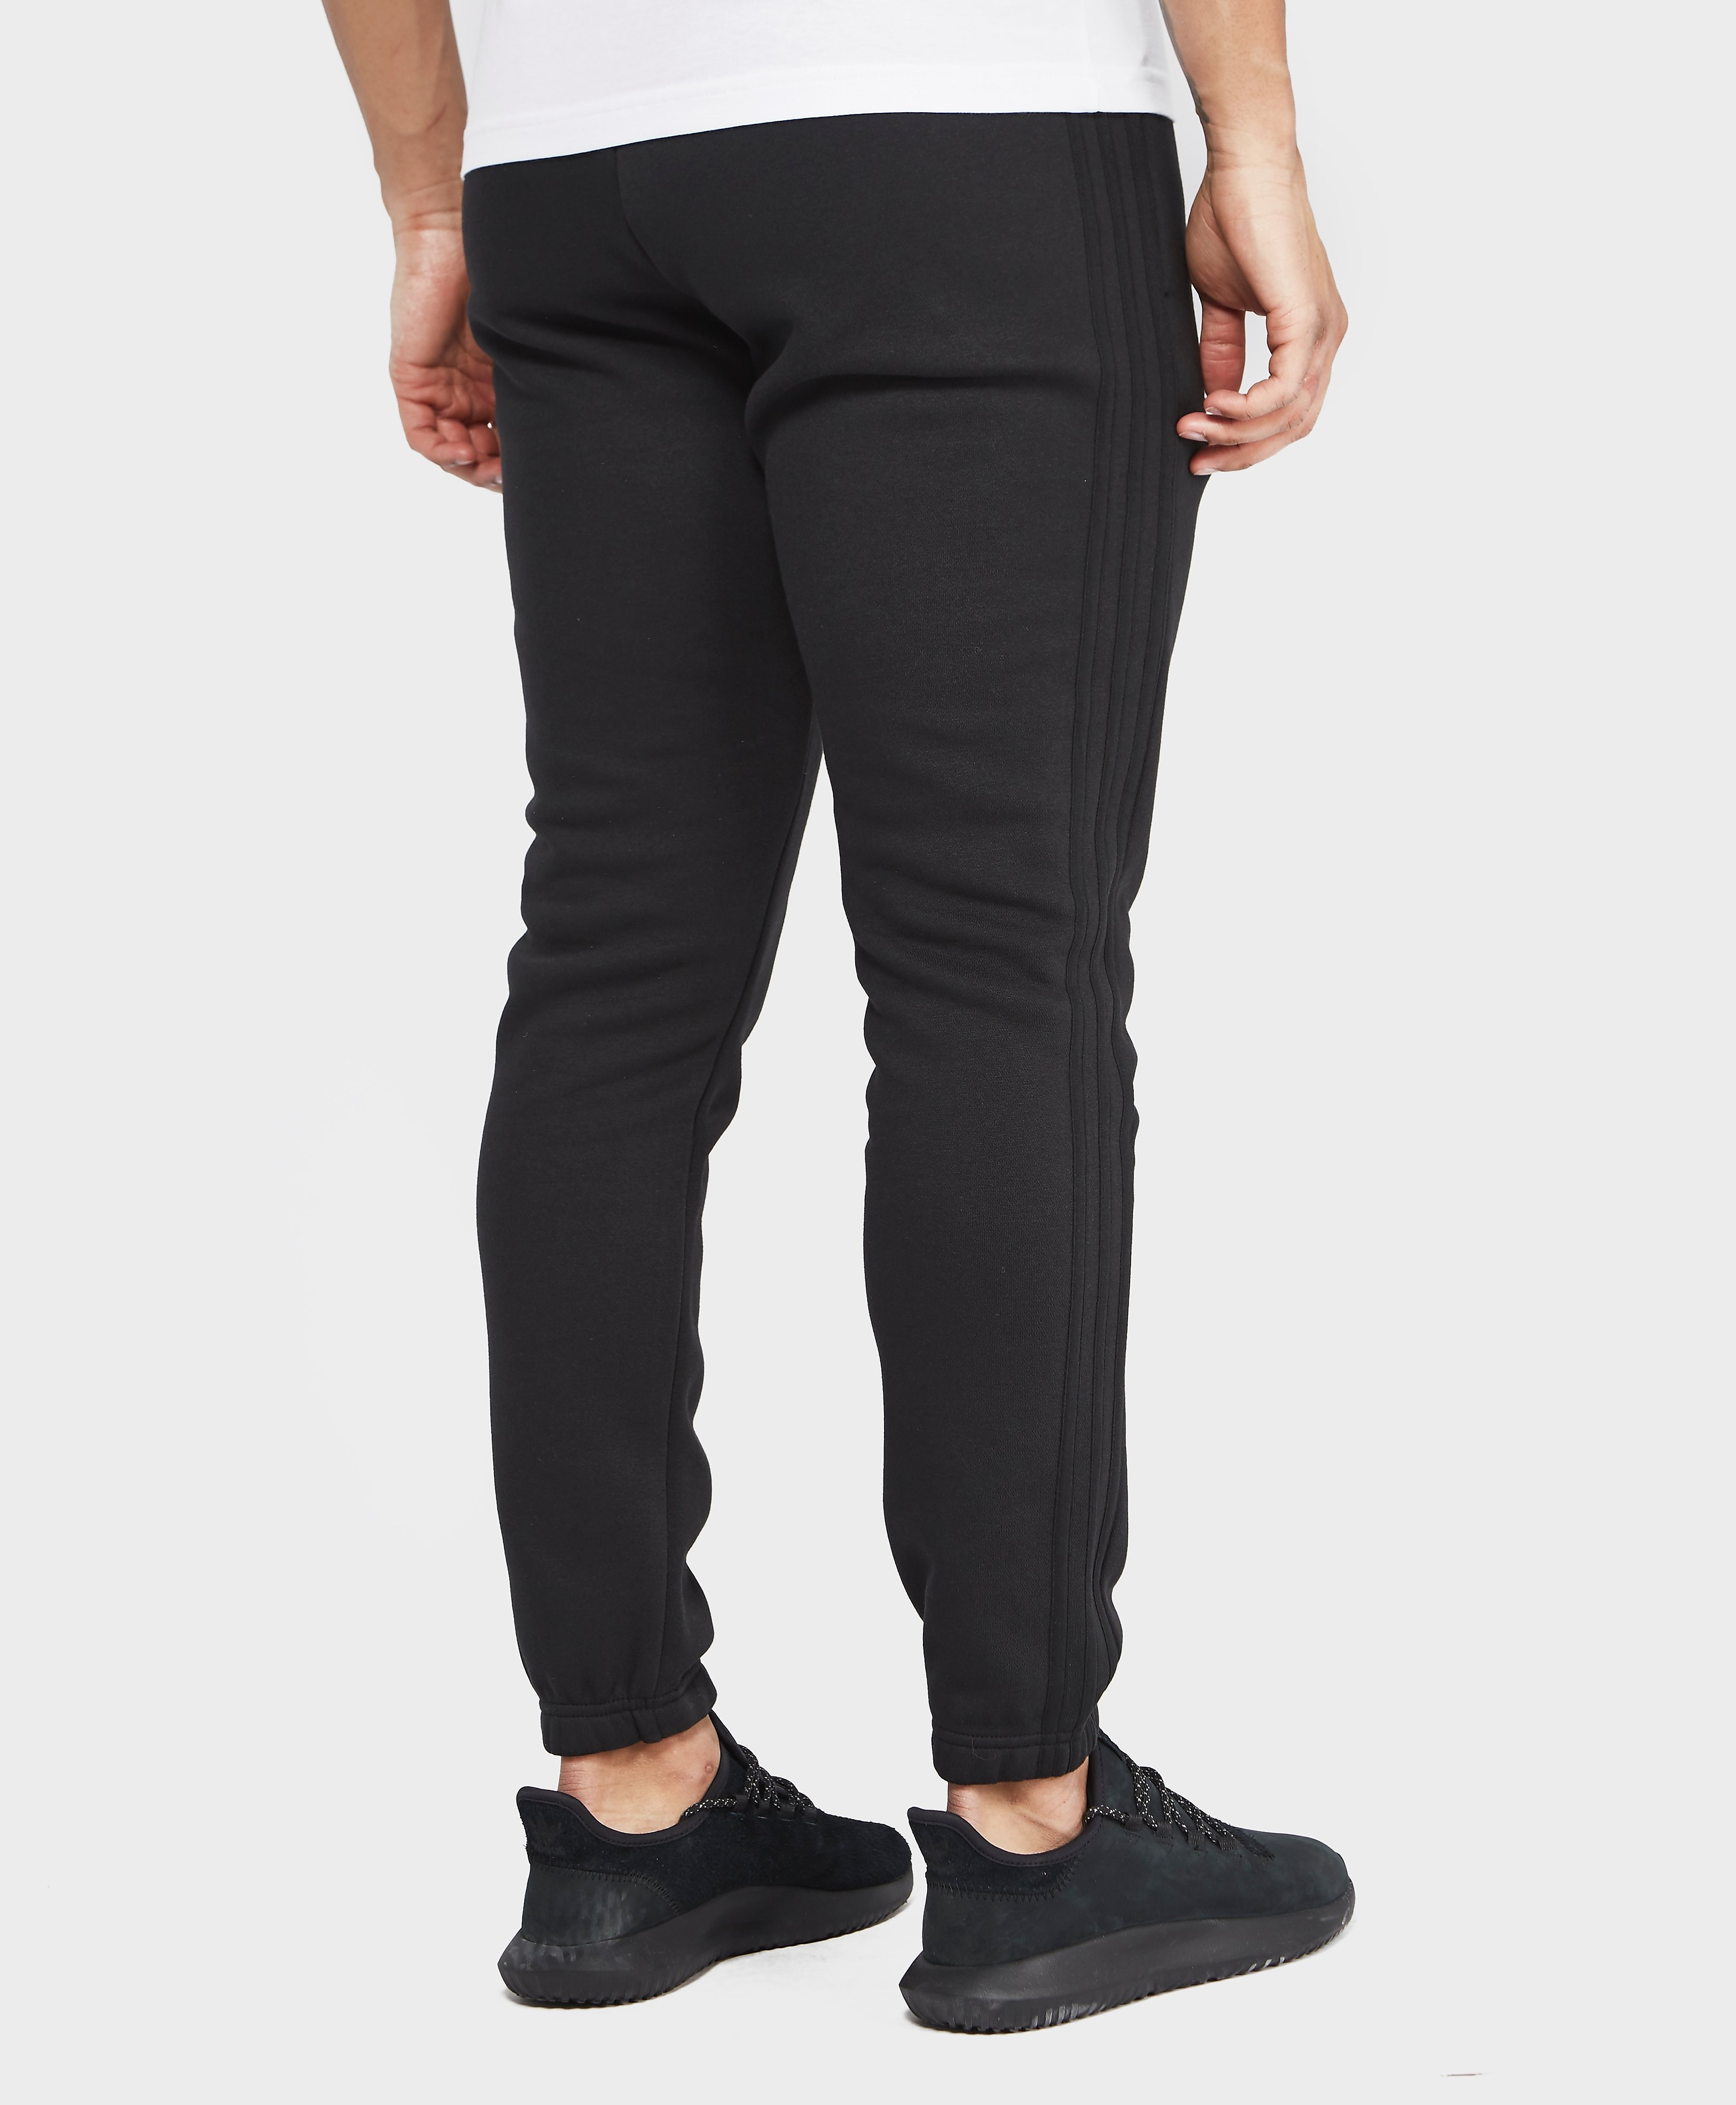 adidas Originals Trefoil Track Pants